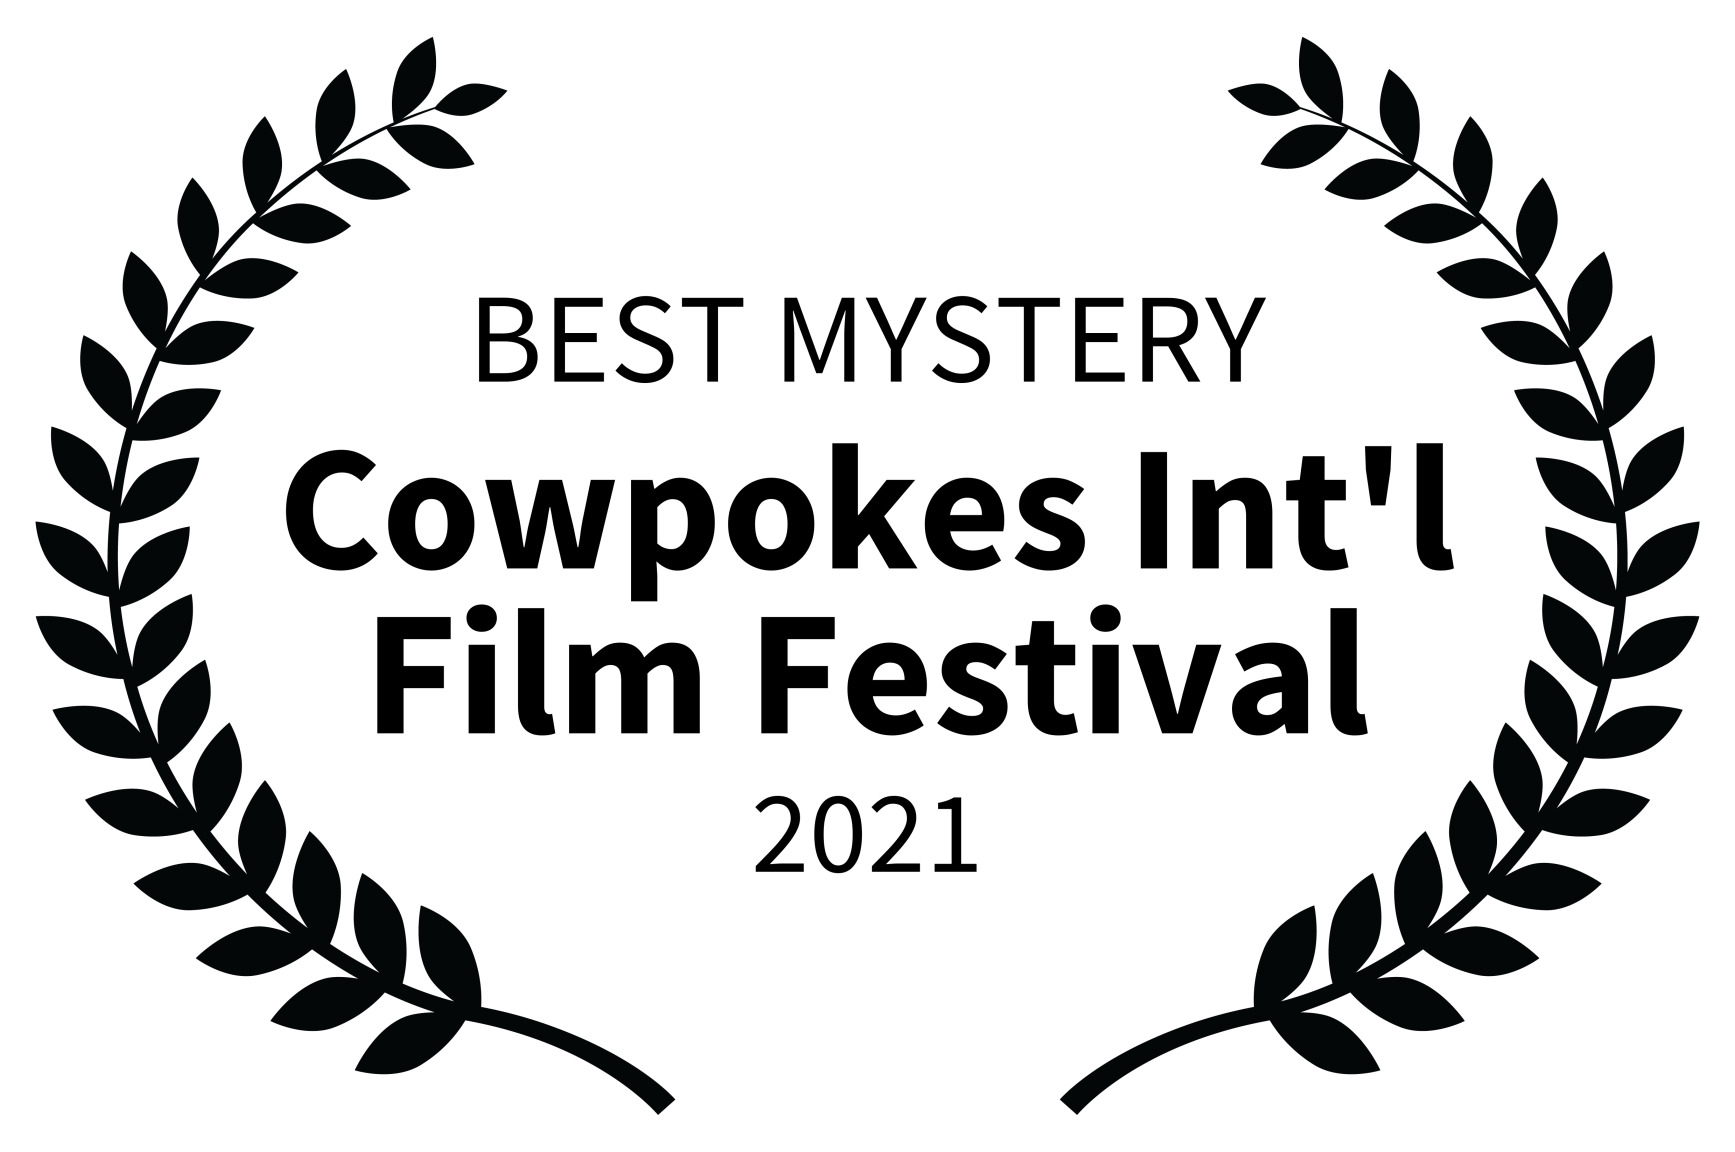 BEST MYSTERY - Cowpokes Intl Film Festival - 2021